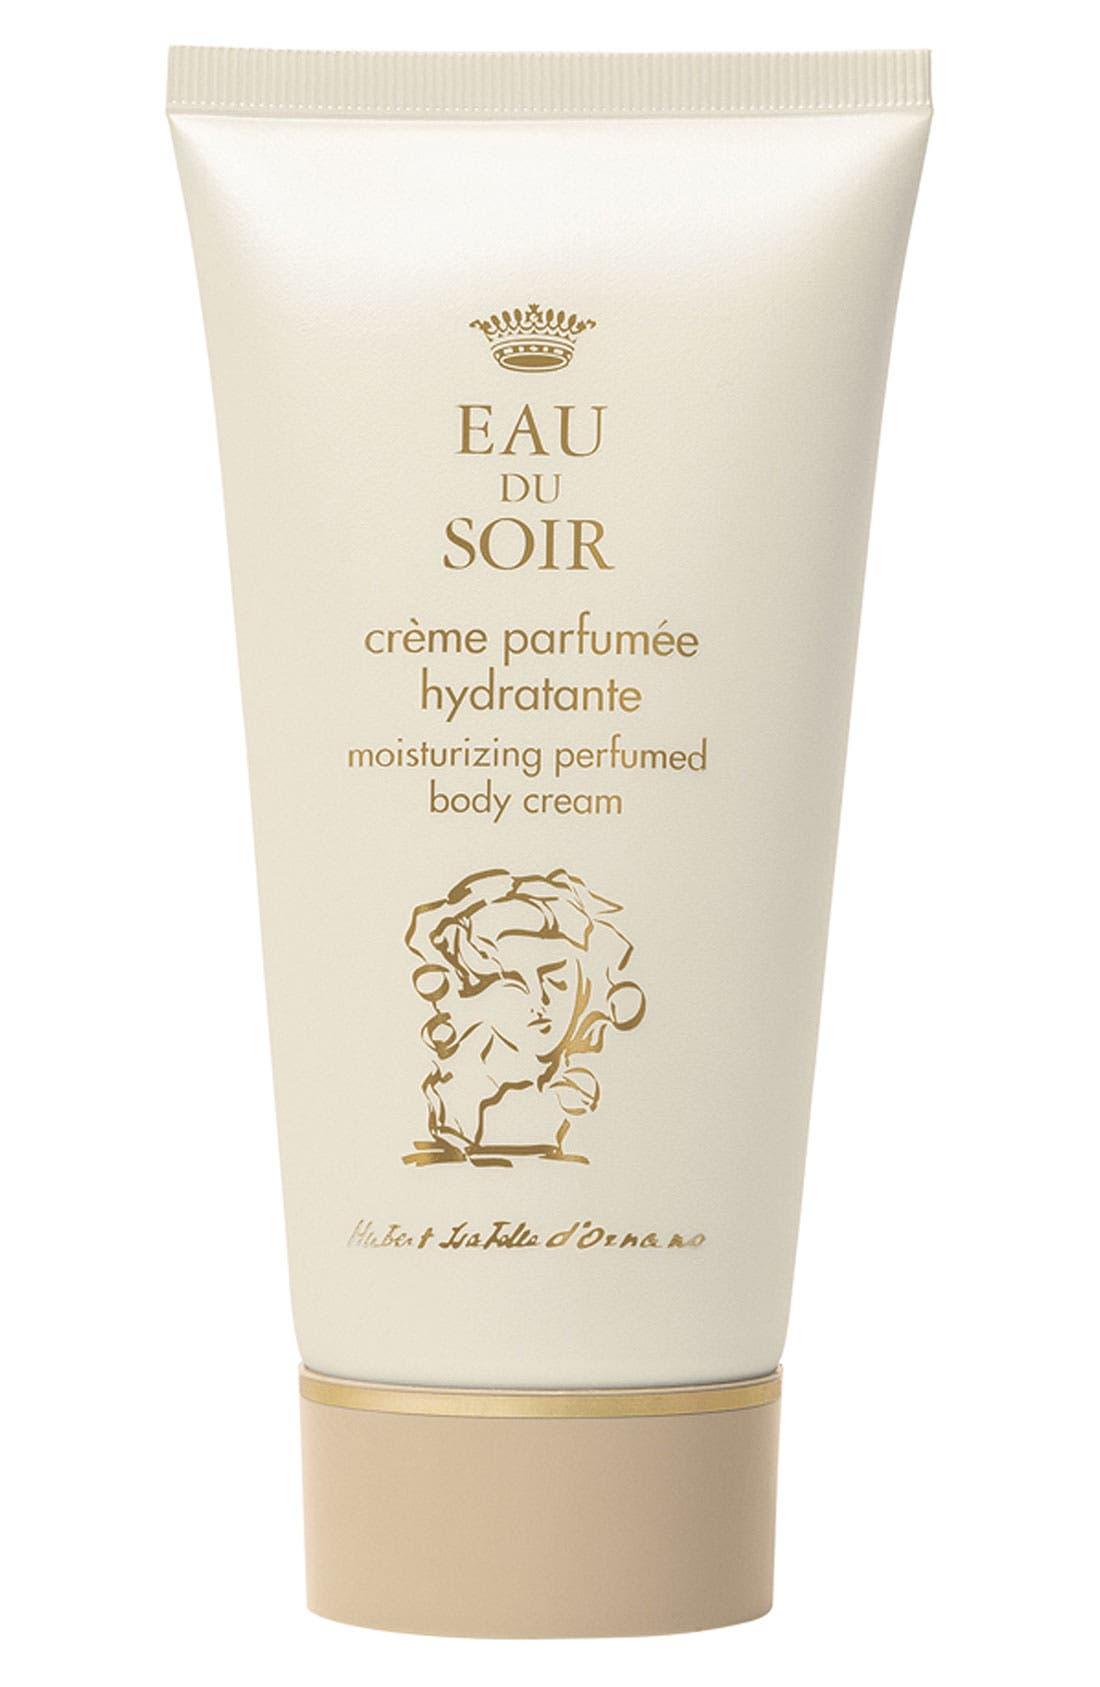 SISLEY PARIS Eau du Soir Moisturizing Perfumed Body Cream, Main, color, NONE